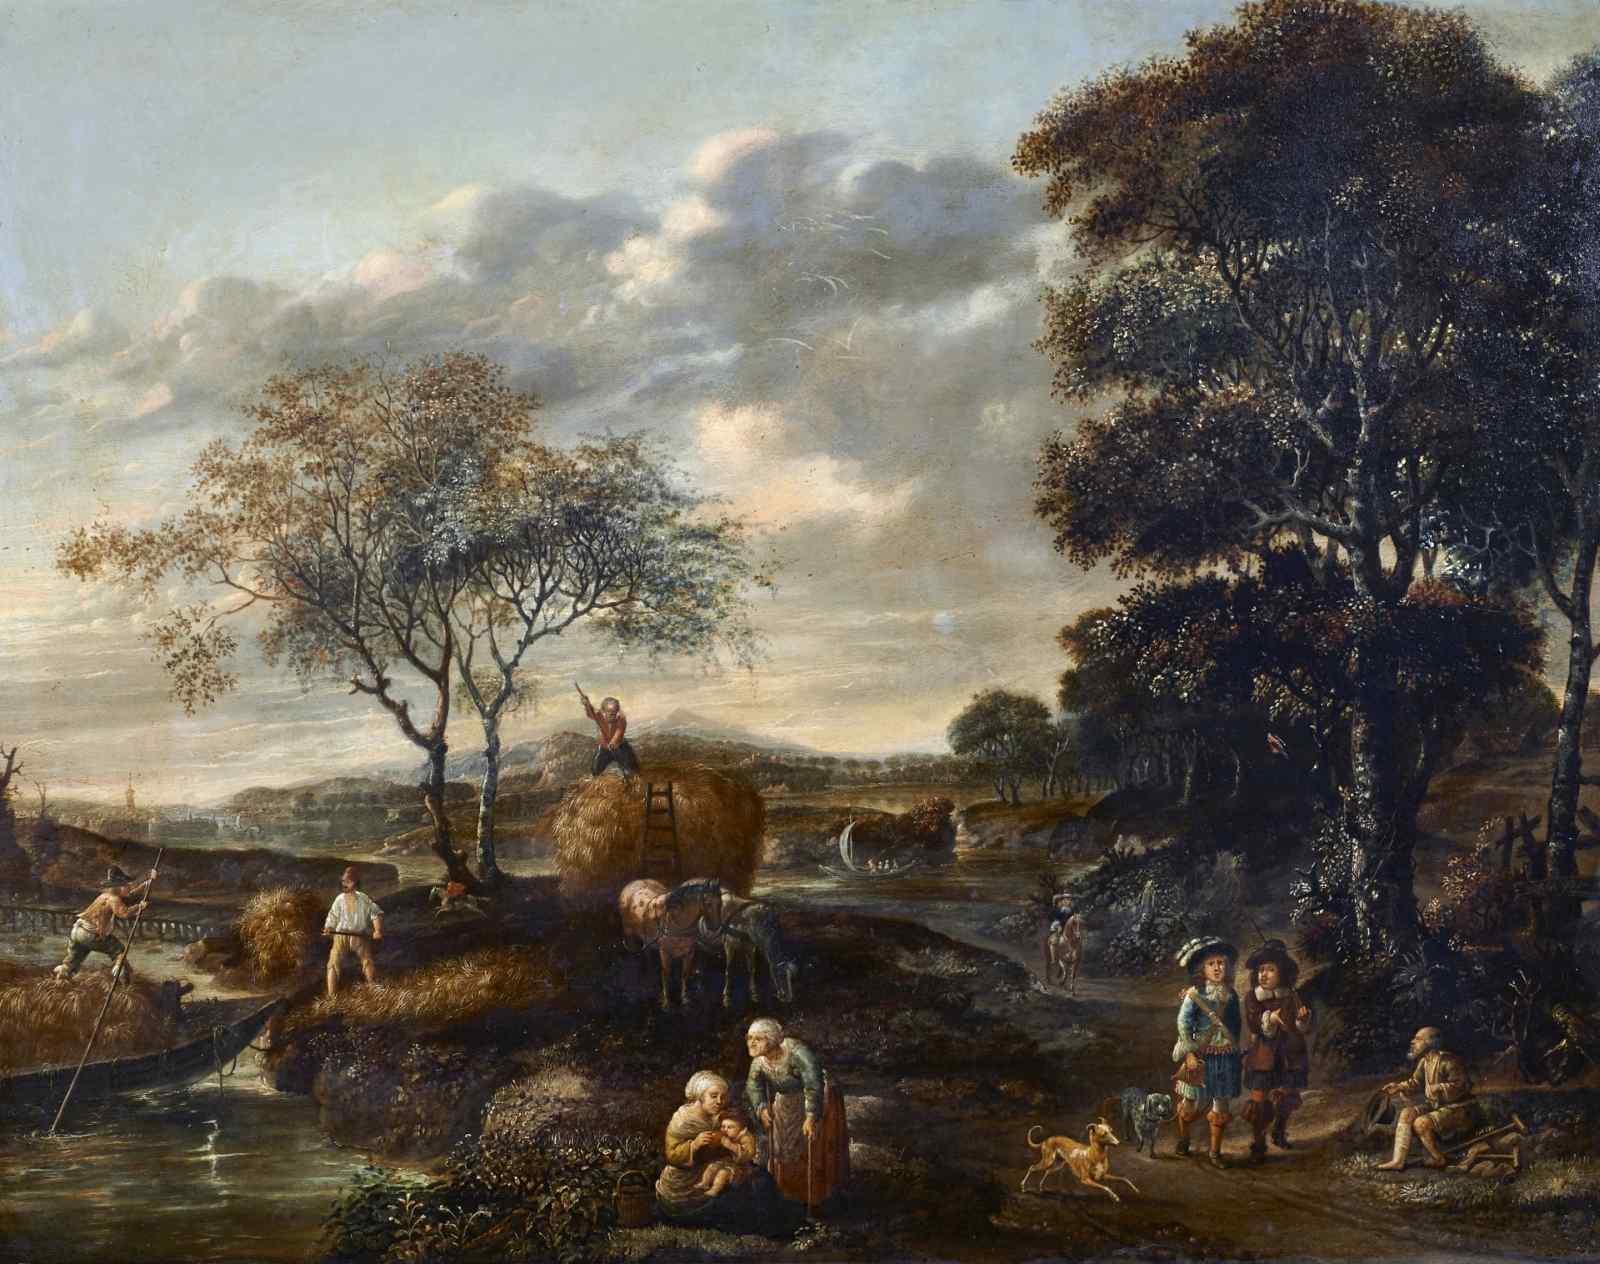 Paesaggio en plen air firmato J. Z. Blijhooft fecit 1668